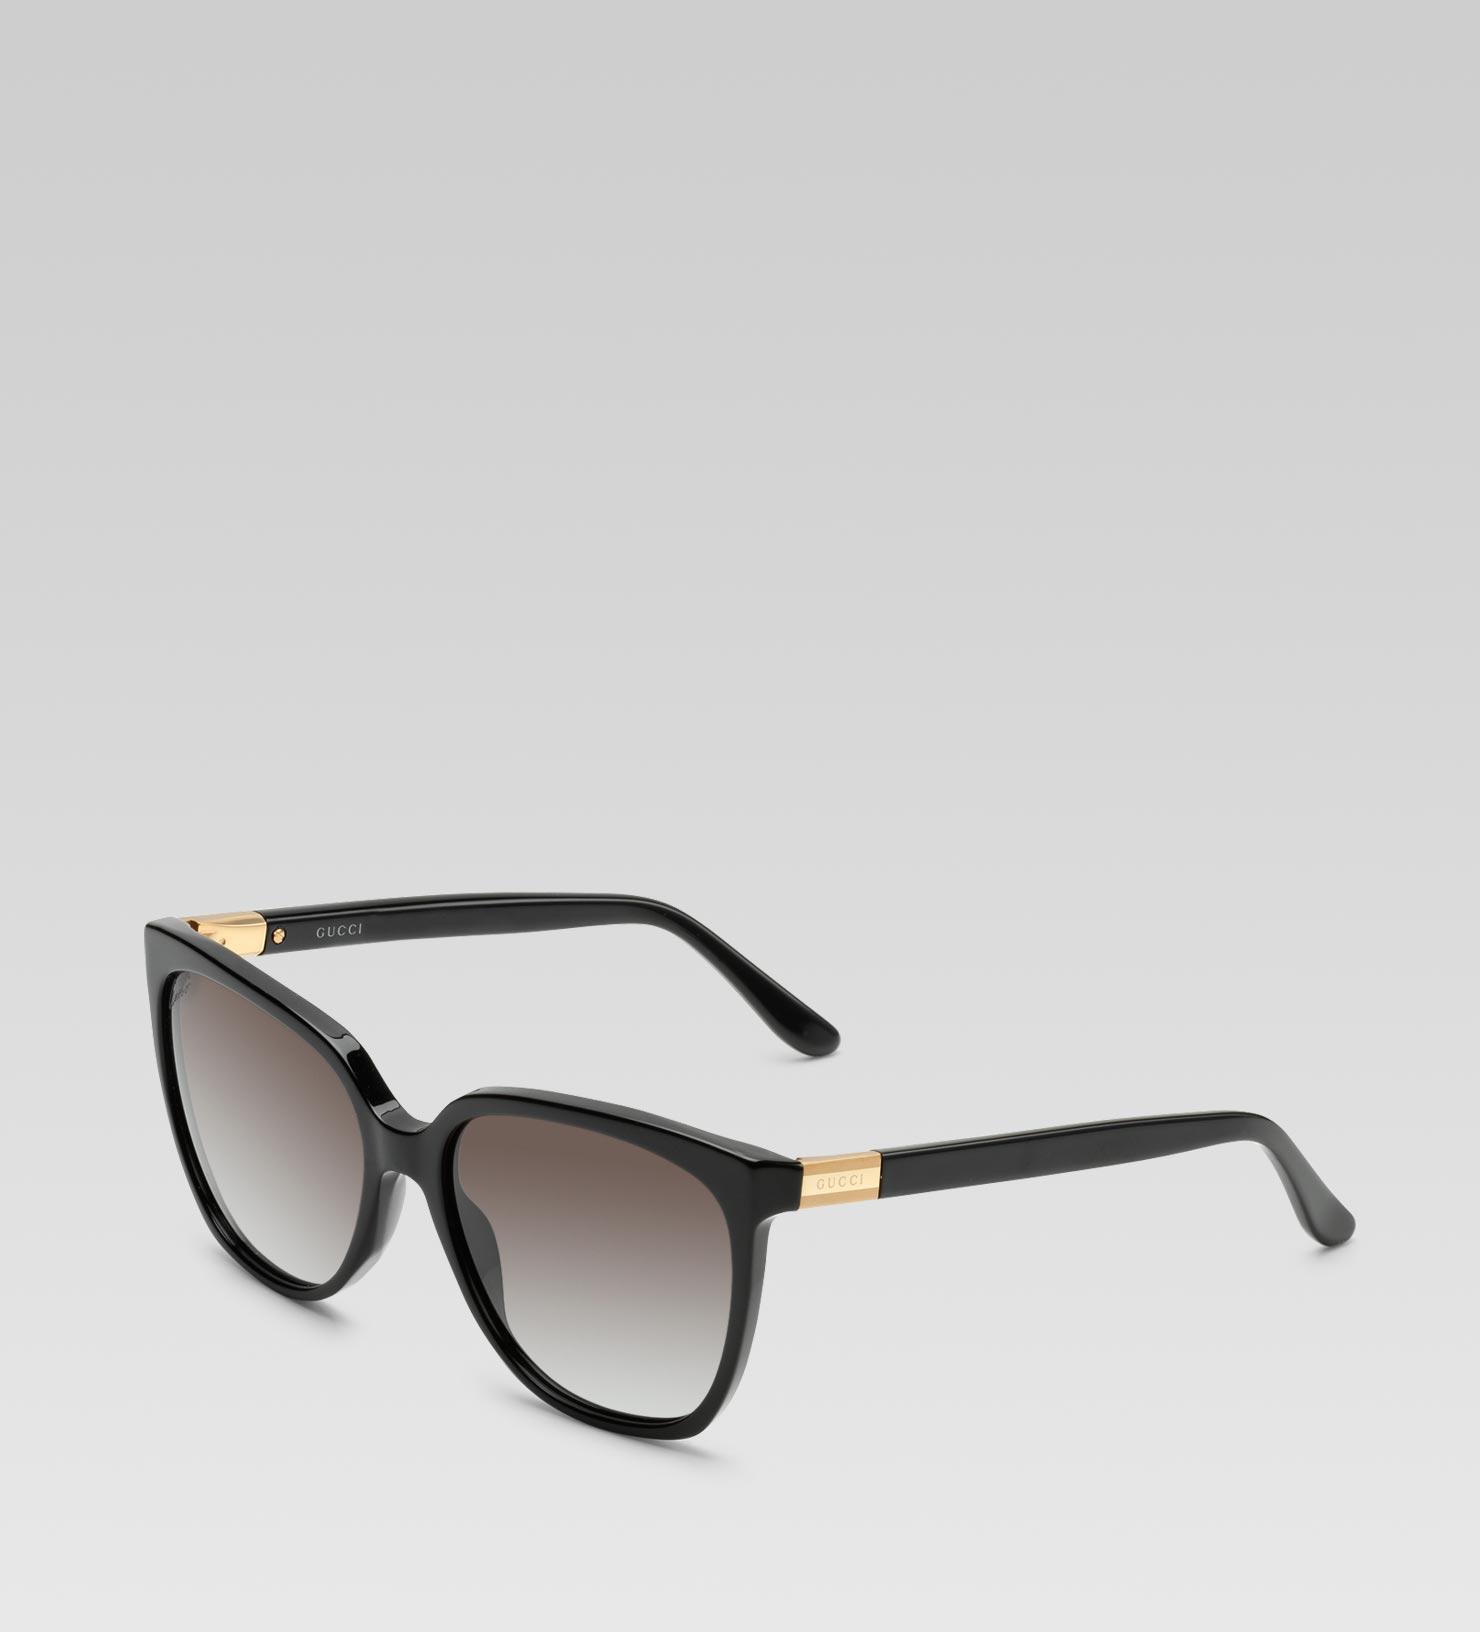 66cc9668a6 Gucci Medium Square Frame Sunglasses with Gucci Web Plaque Logo and ...